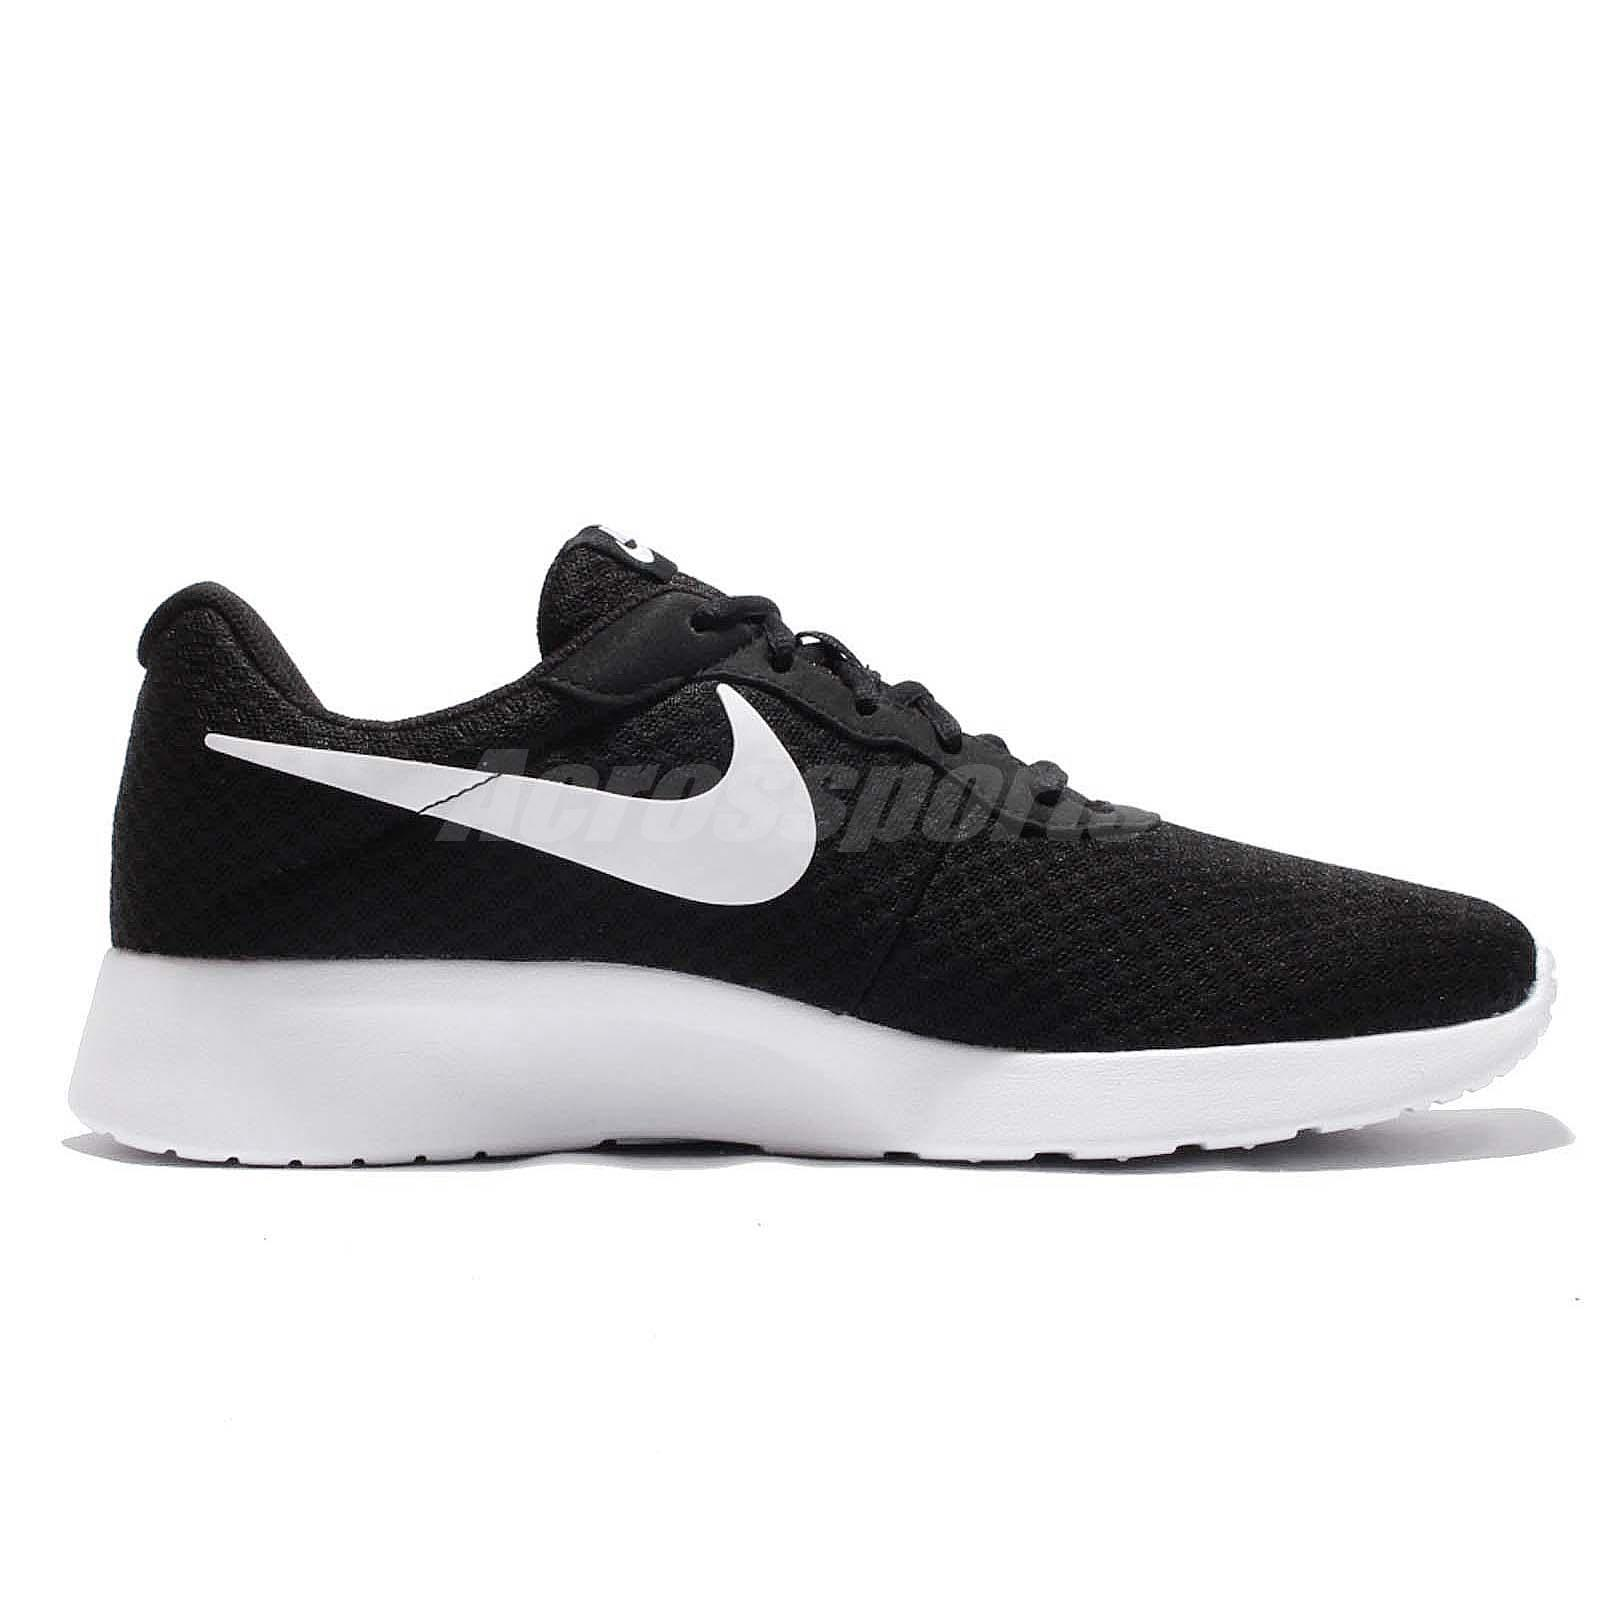 beb5d5458 Nike Tanjun Black White Sportswear Men Running Shoes NSW Sneakers ...